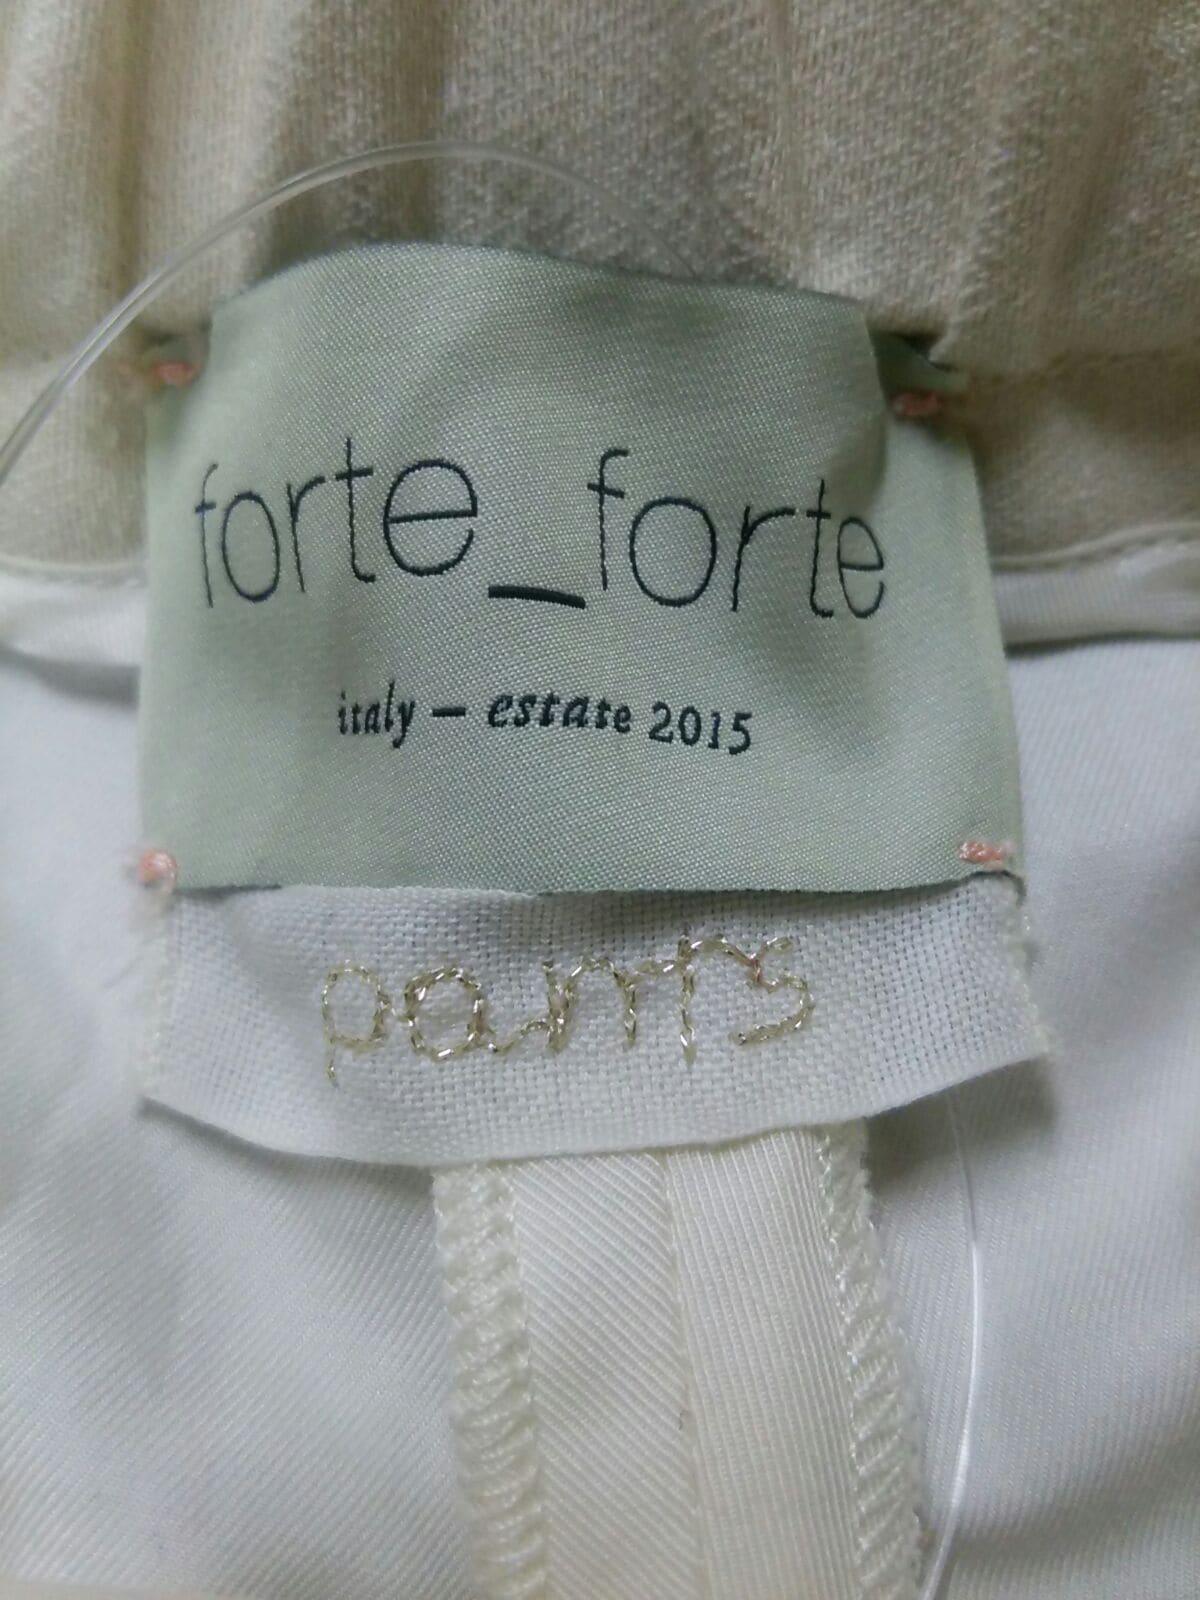 forte_forte(フォルテフォルテ)のパンツ